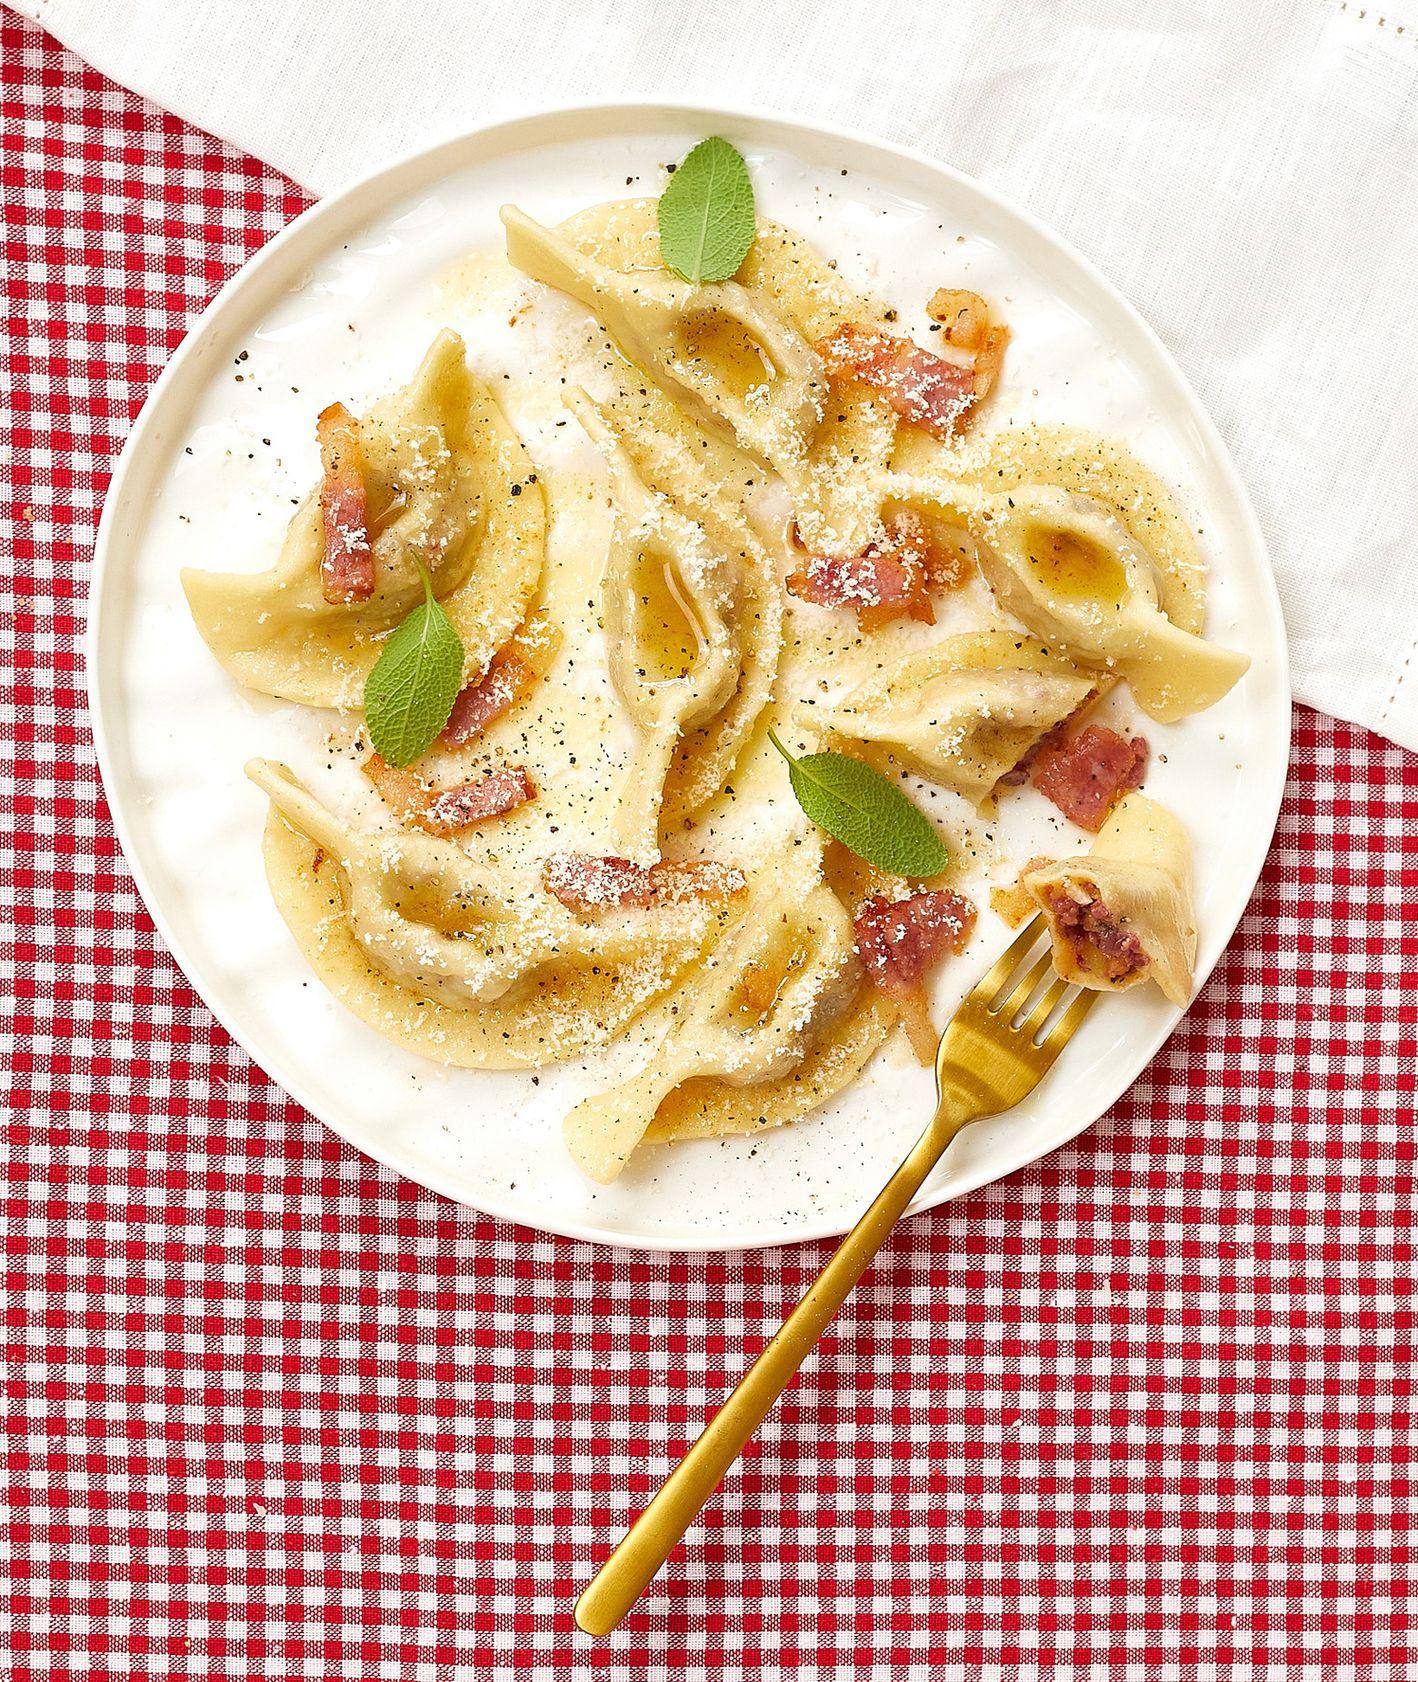 Włoska kuchnia - sery. Casoncelli alla bergamasca (fot. Maciek Niemojewski)